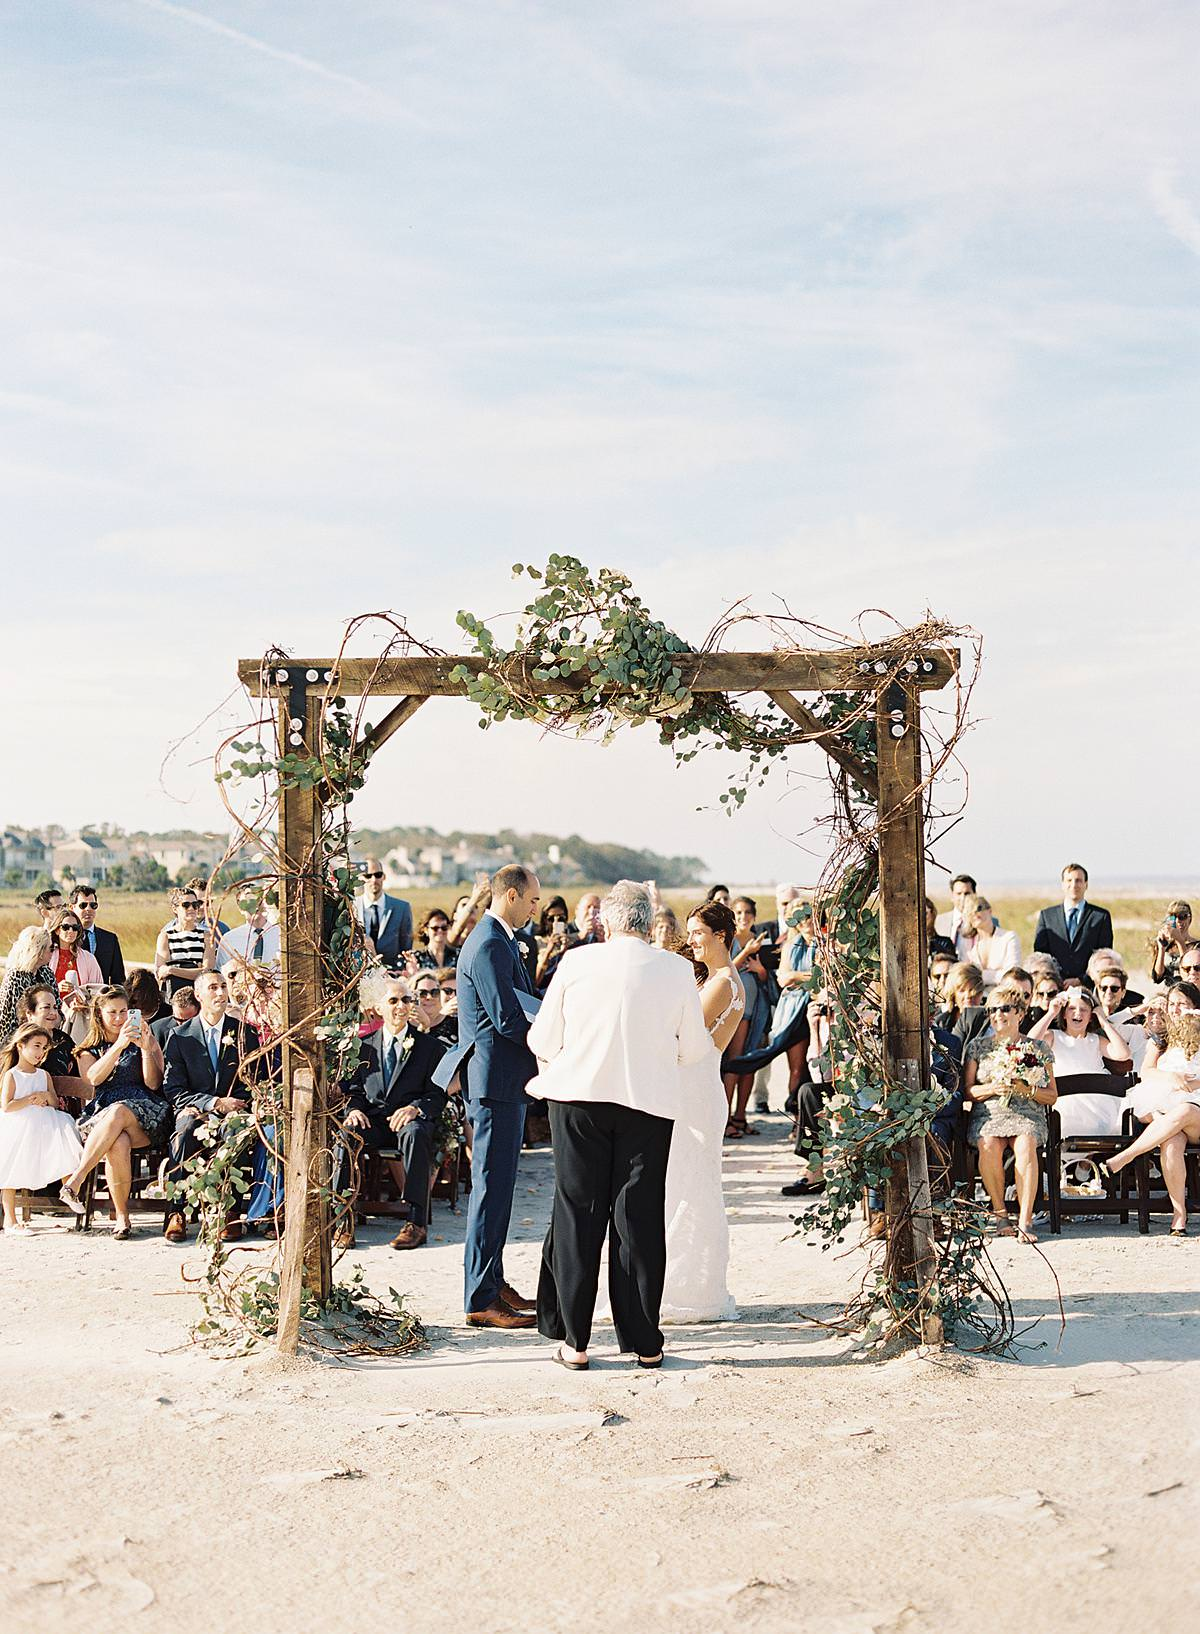 hurricane matthew wedding ceremony